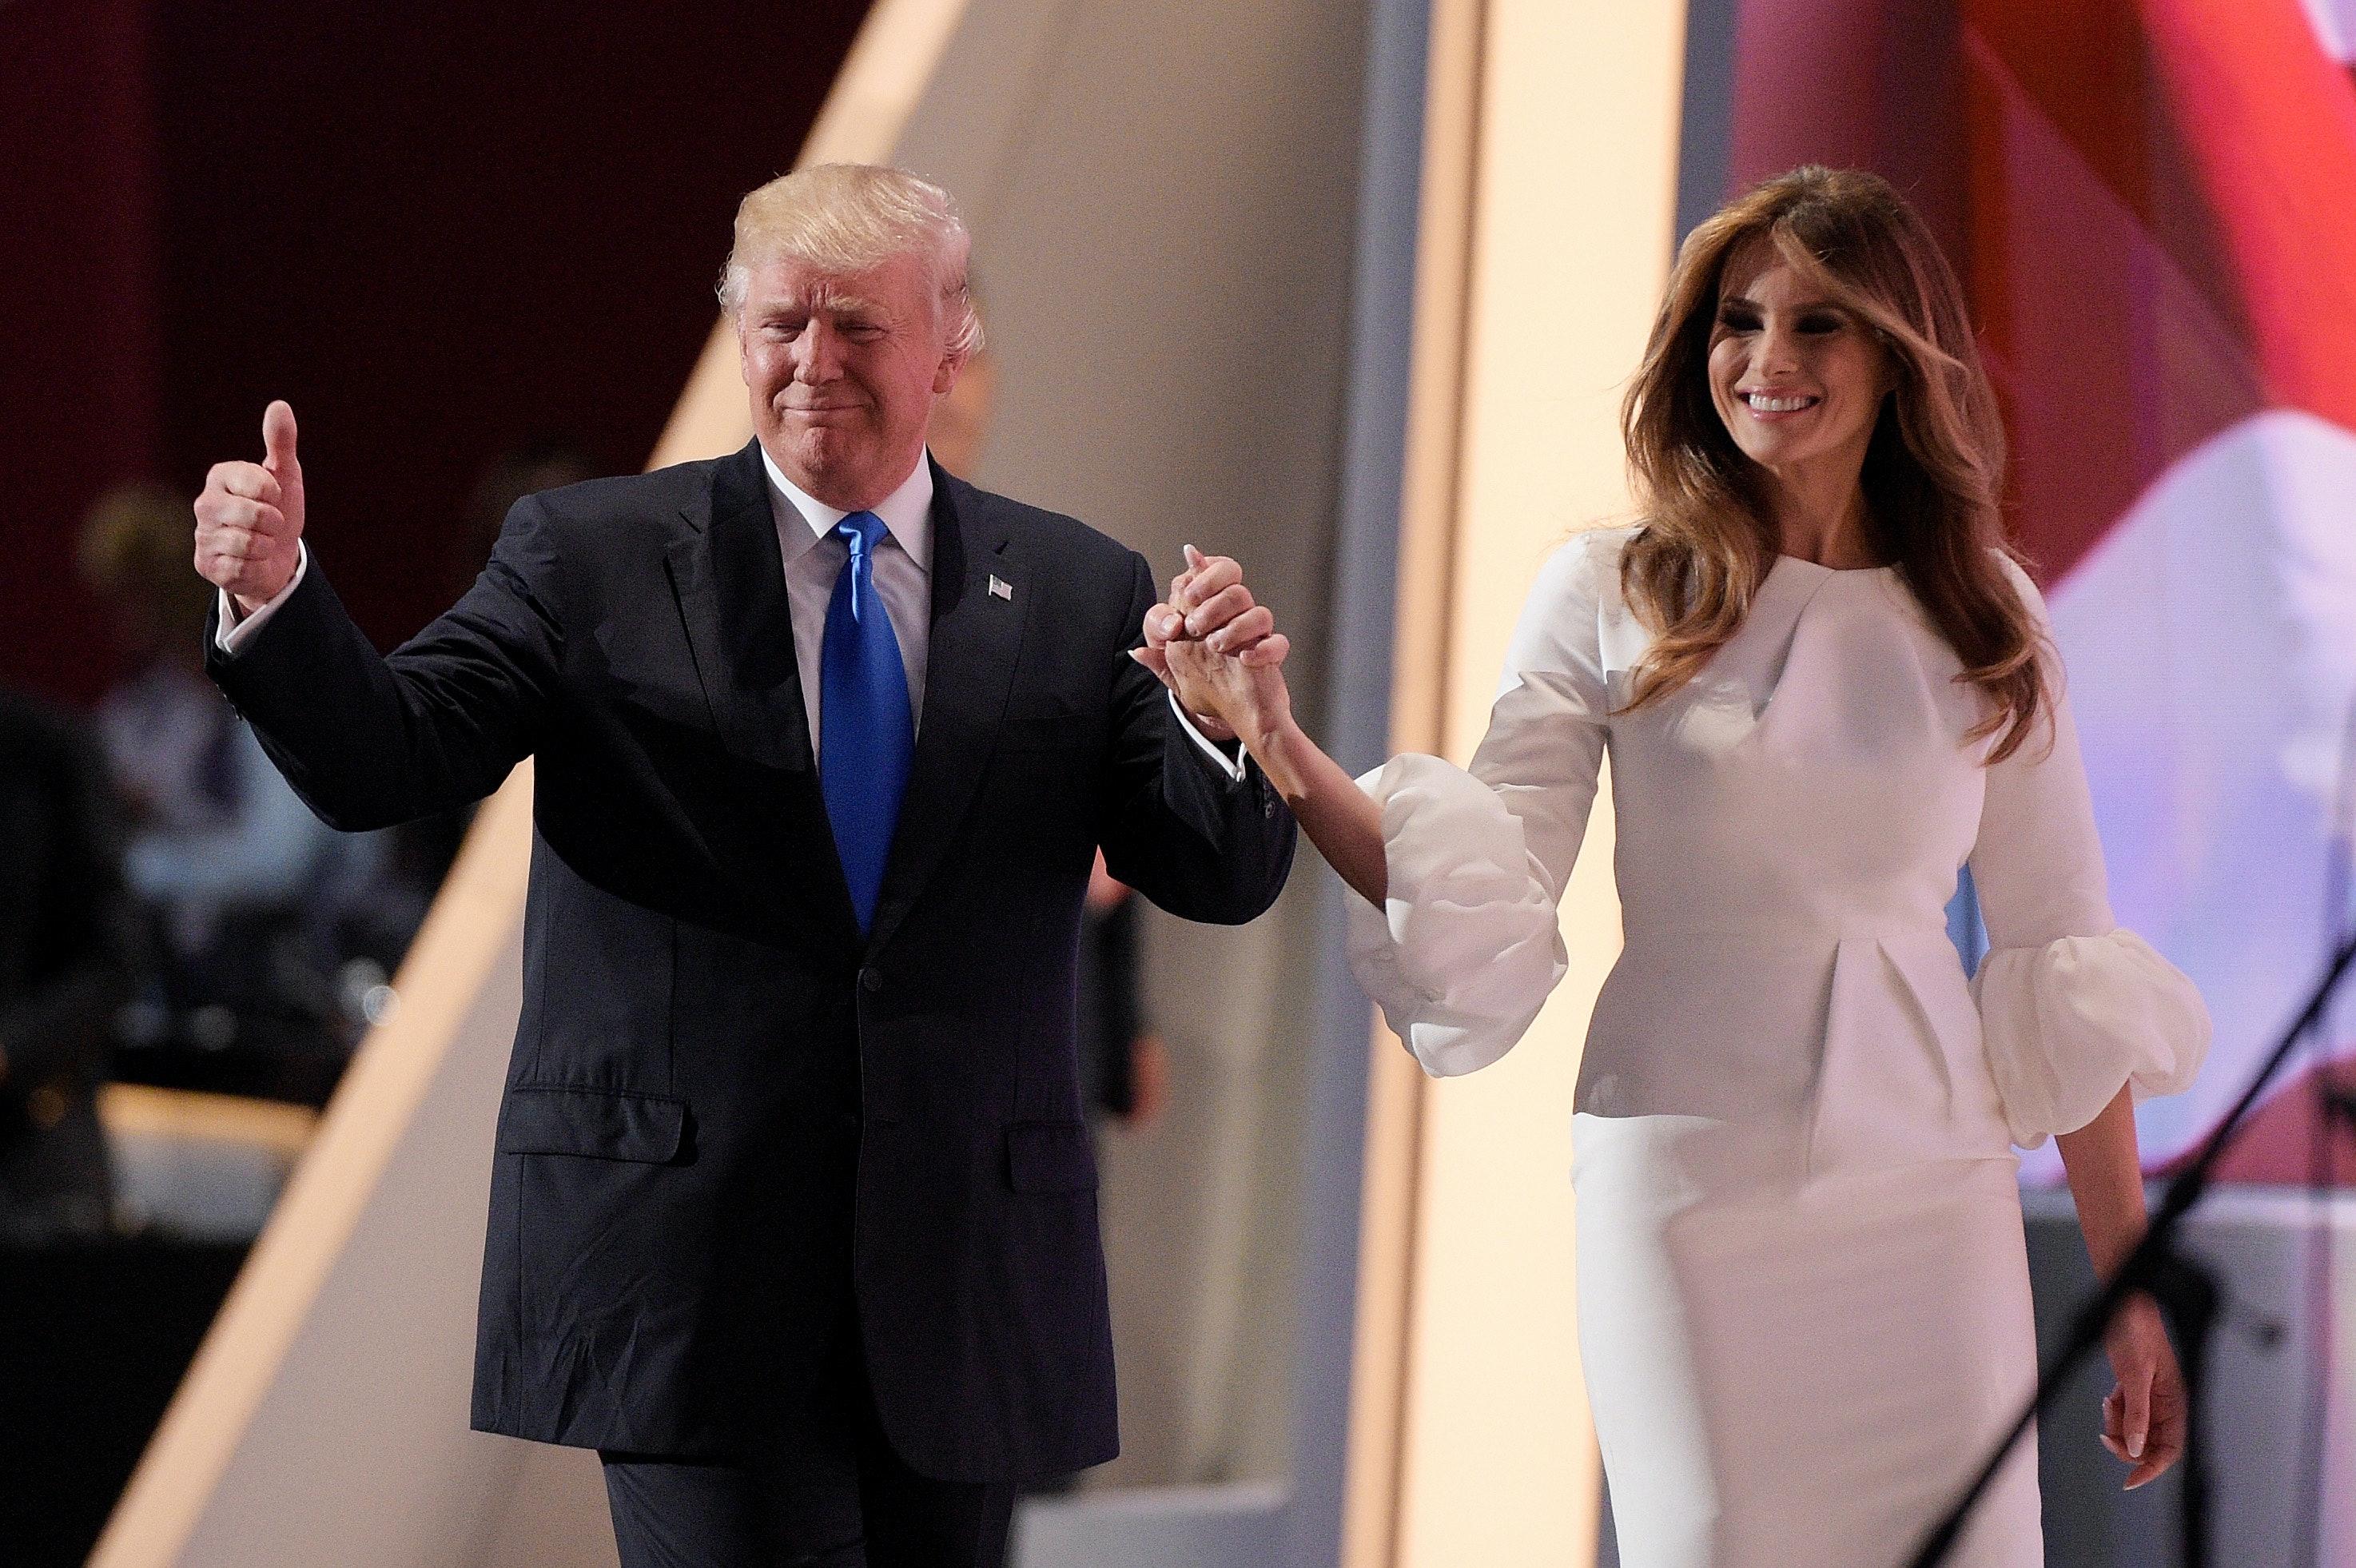 Melania Trump: My husband and I are